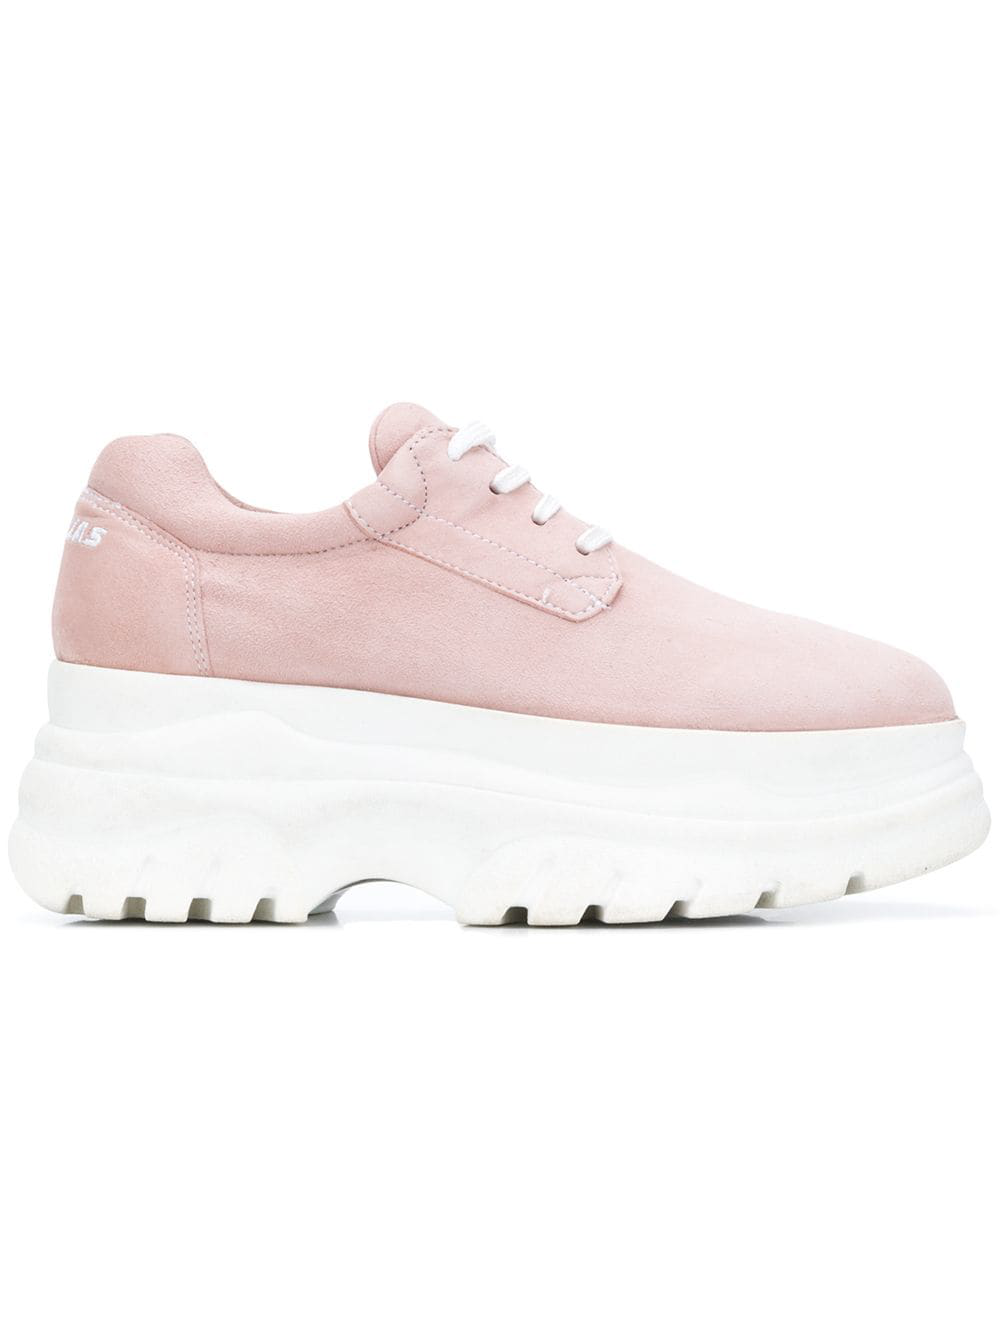 cc8fa8da3bf481 Joshua Sanders  Spice Dollar  Sneakers Mit Plateau - Rosa In Pink ...